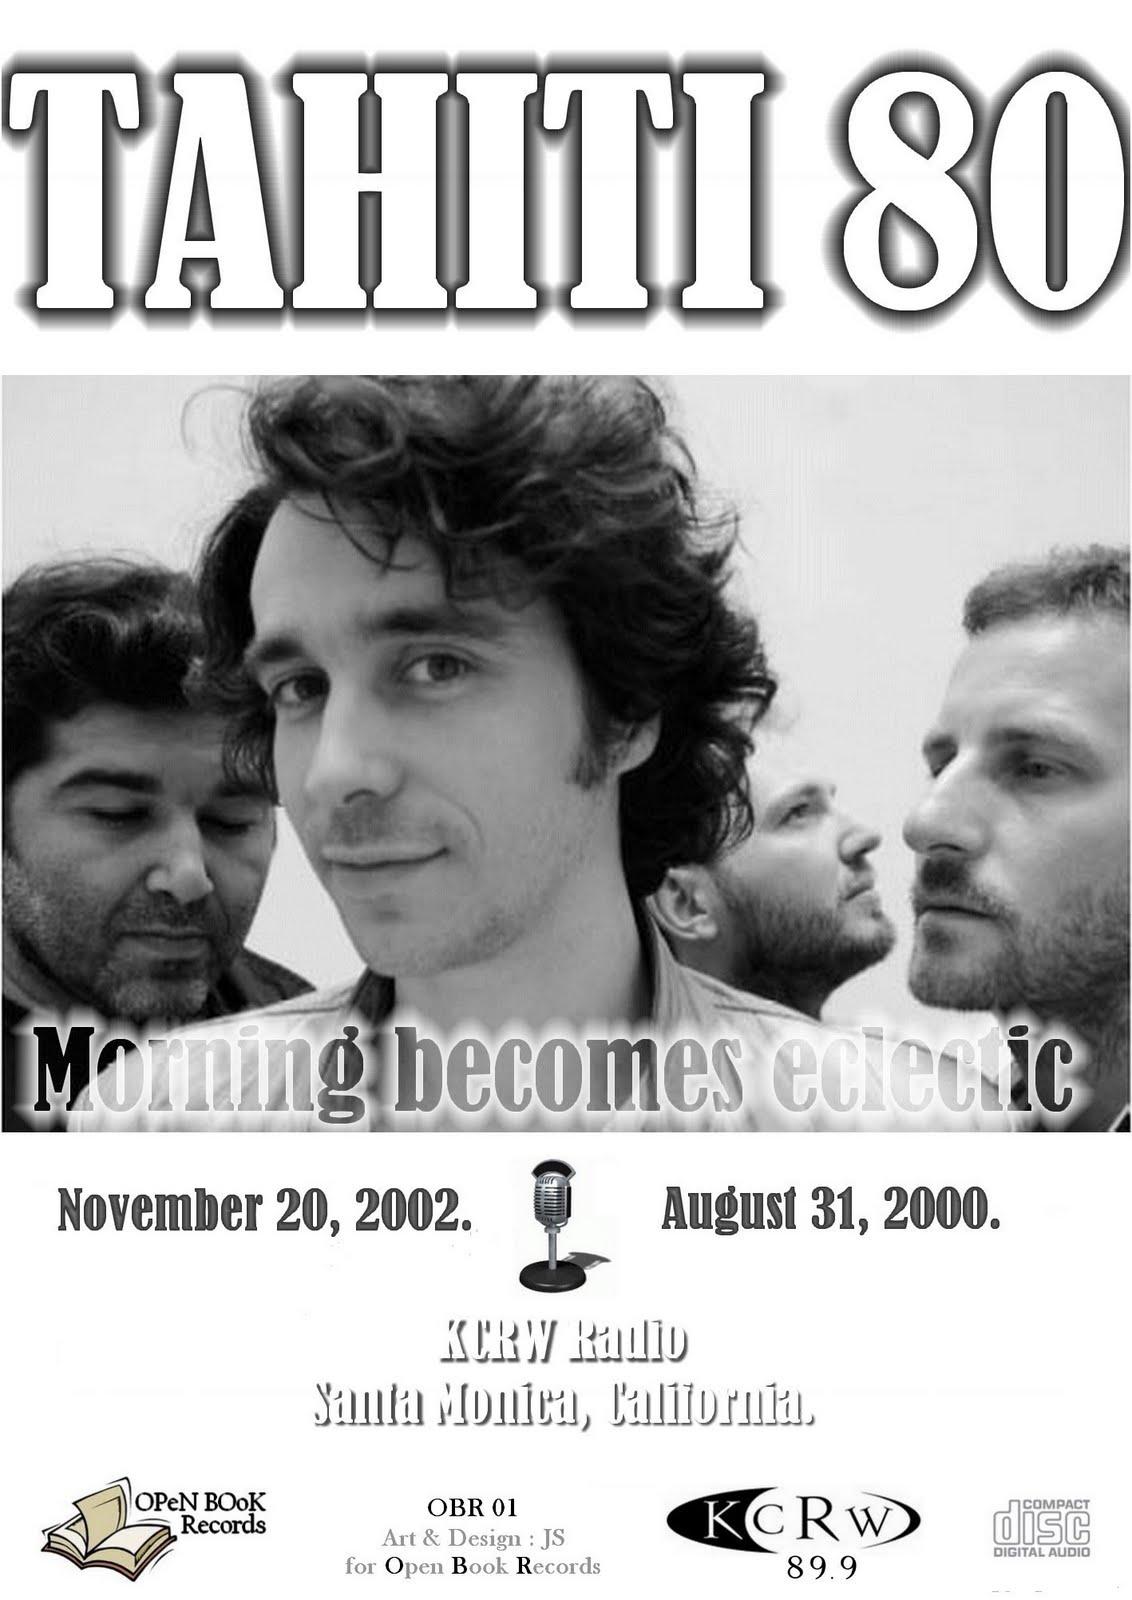 Kcrw radio sessions 2000 2002